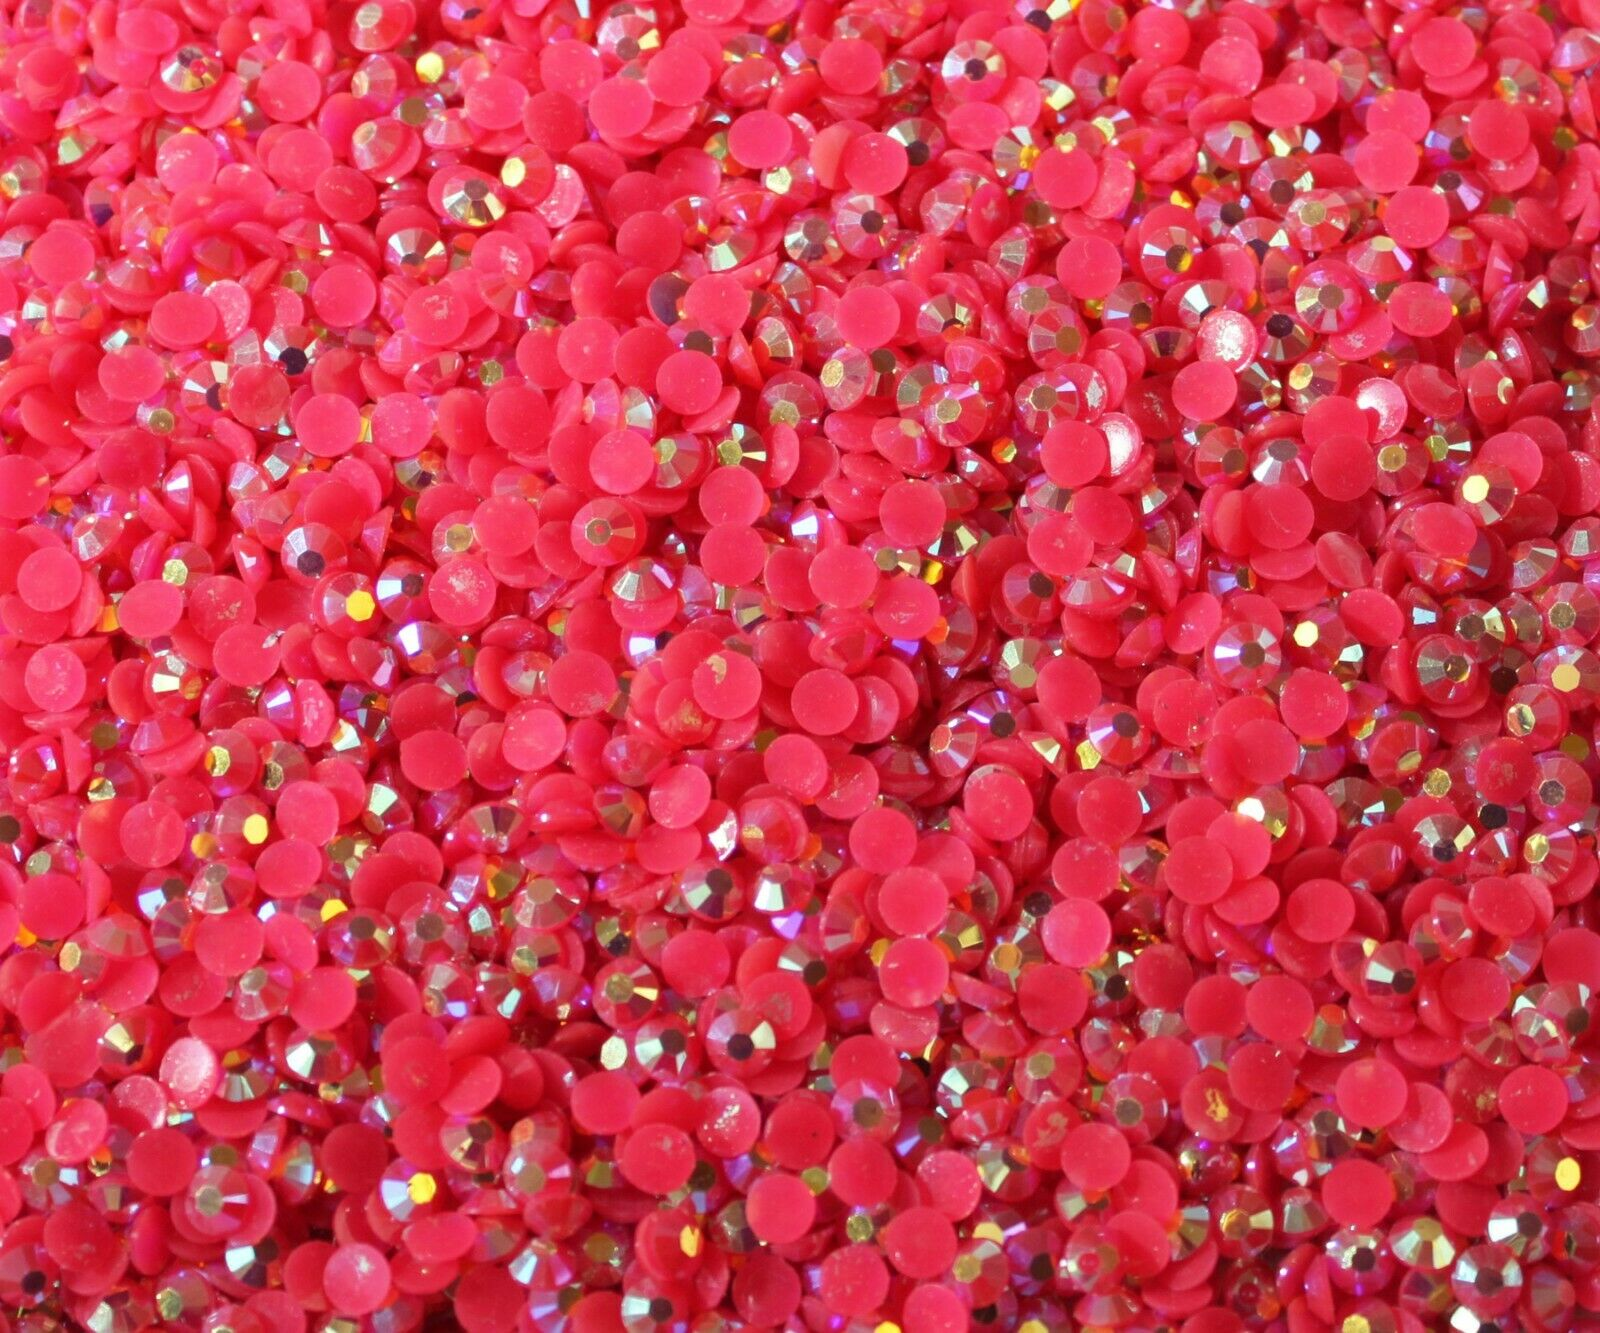 1000 Crystal Flat Back Resin Rhinestones Gems 60 colors, 2mm, 3mm, 4mm, 5mm, 6.5 FUSCHIA AB